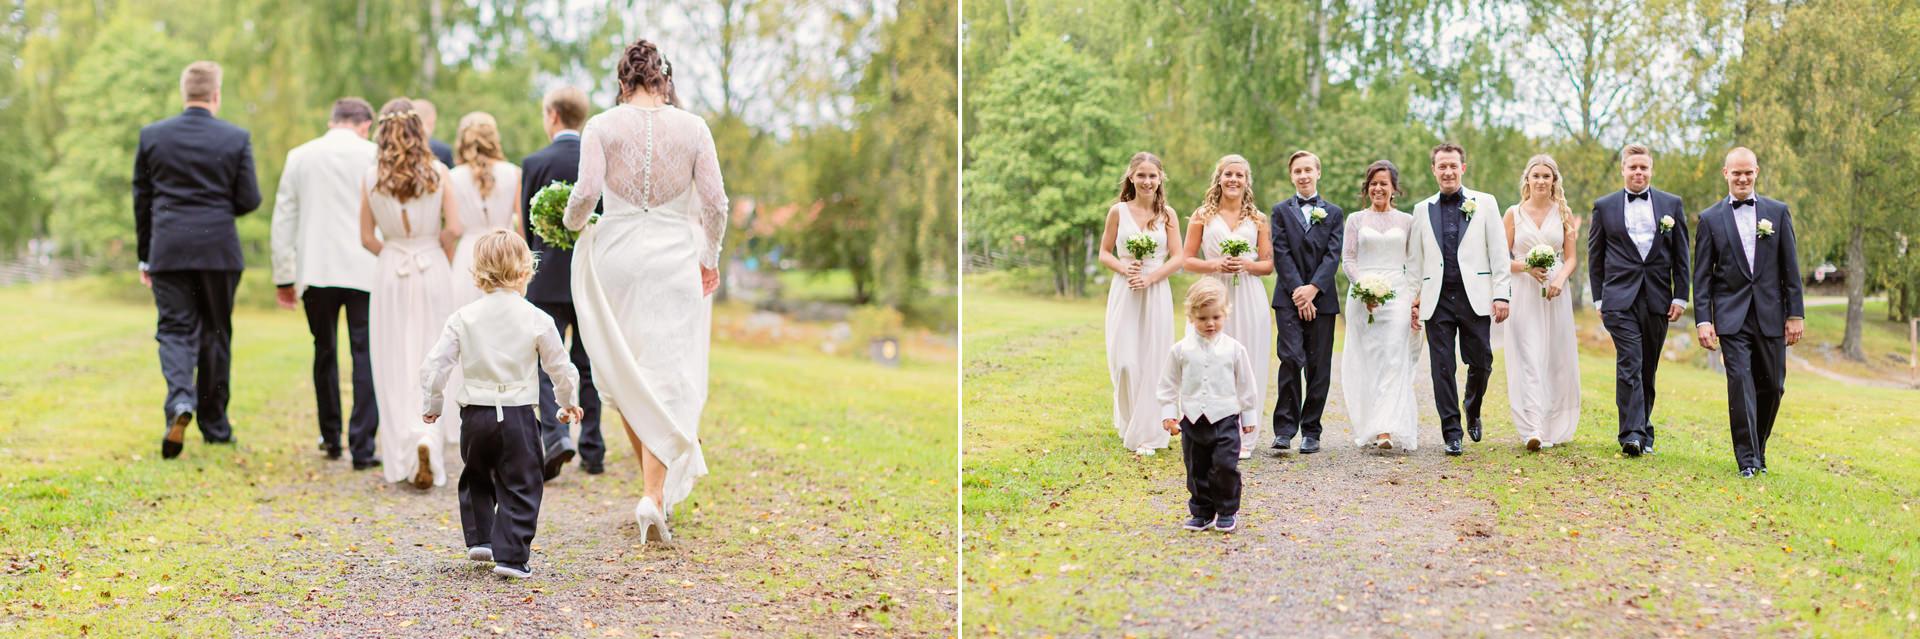 Vigsel i Lida idrottskyrka, Bröllop, Bröllopsfotograf